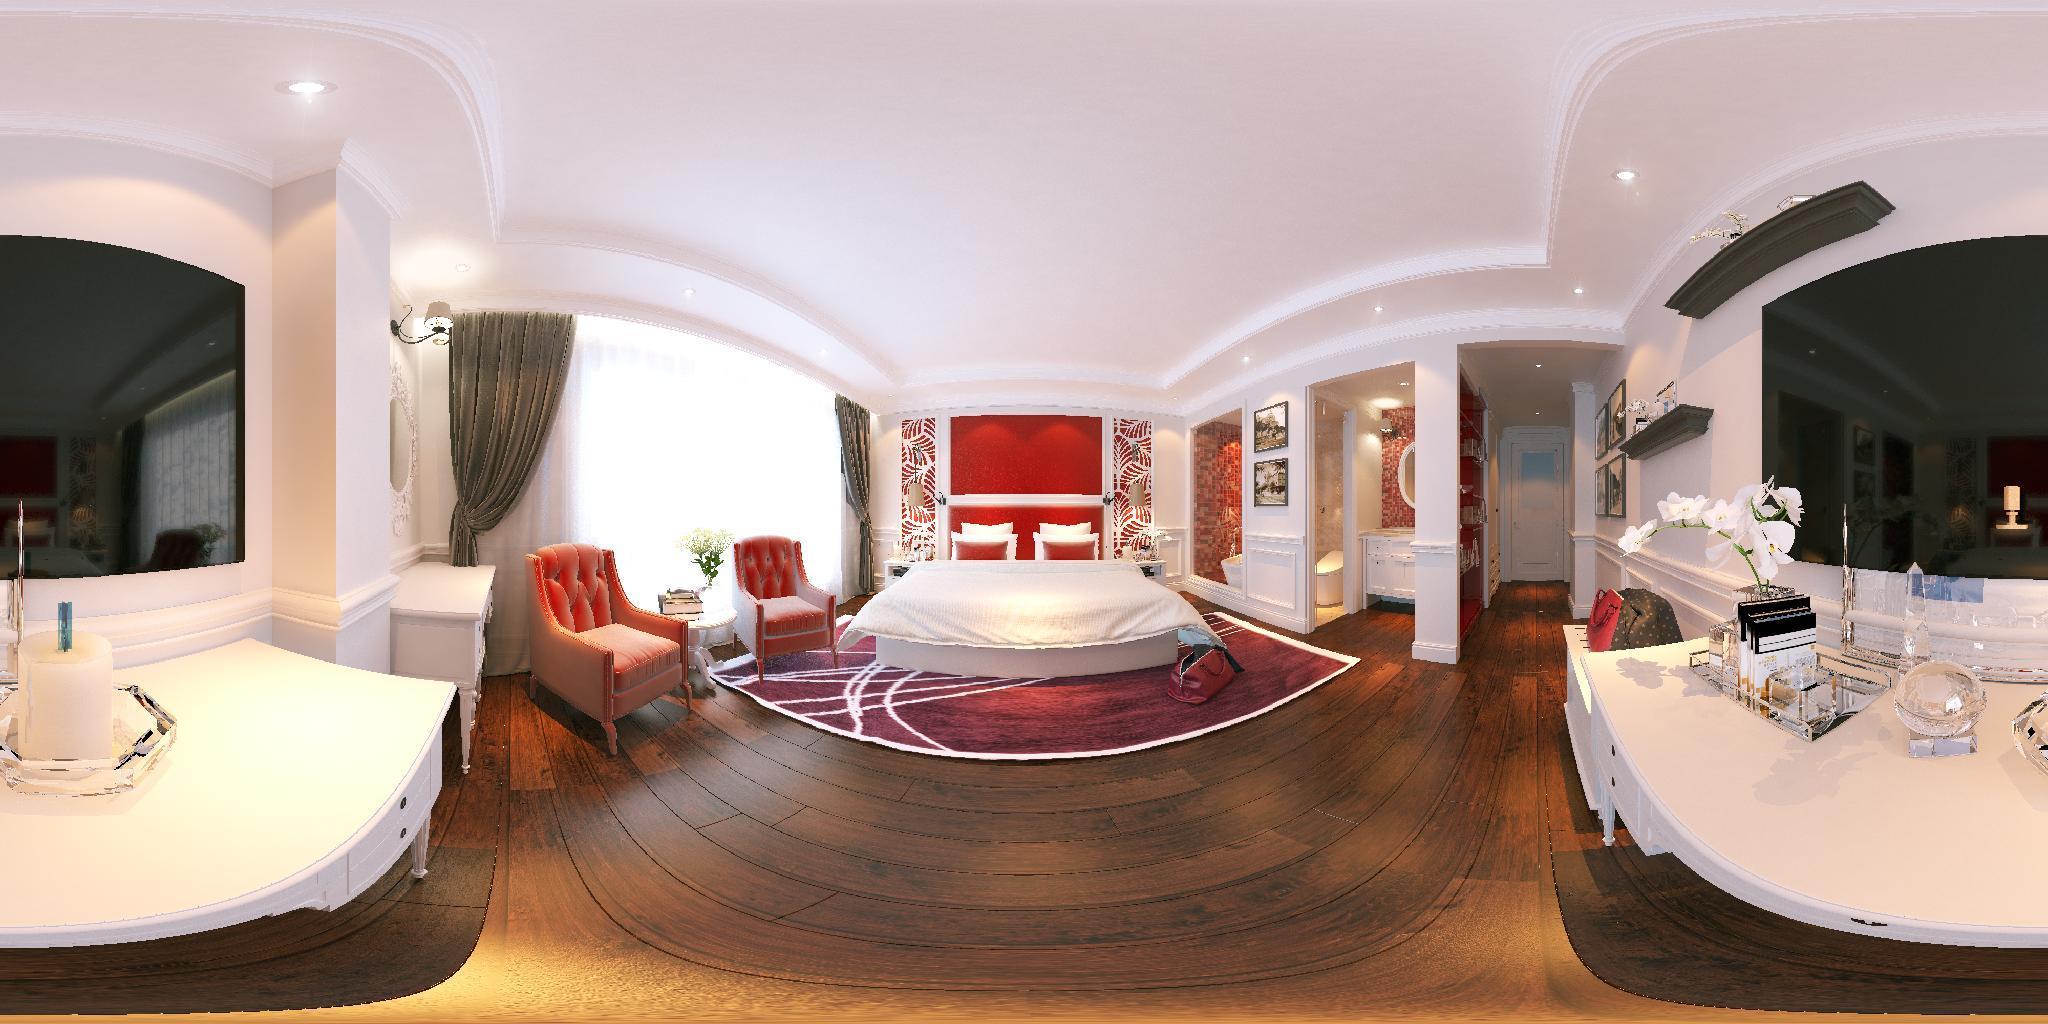 Gem Premier Luxury 4 Stars Hotel And Spa